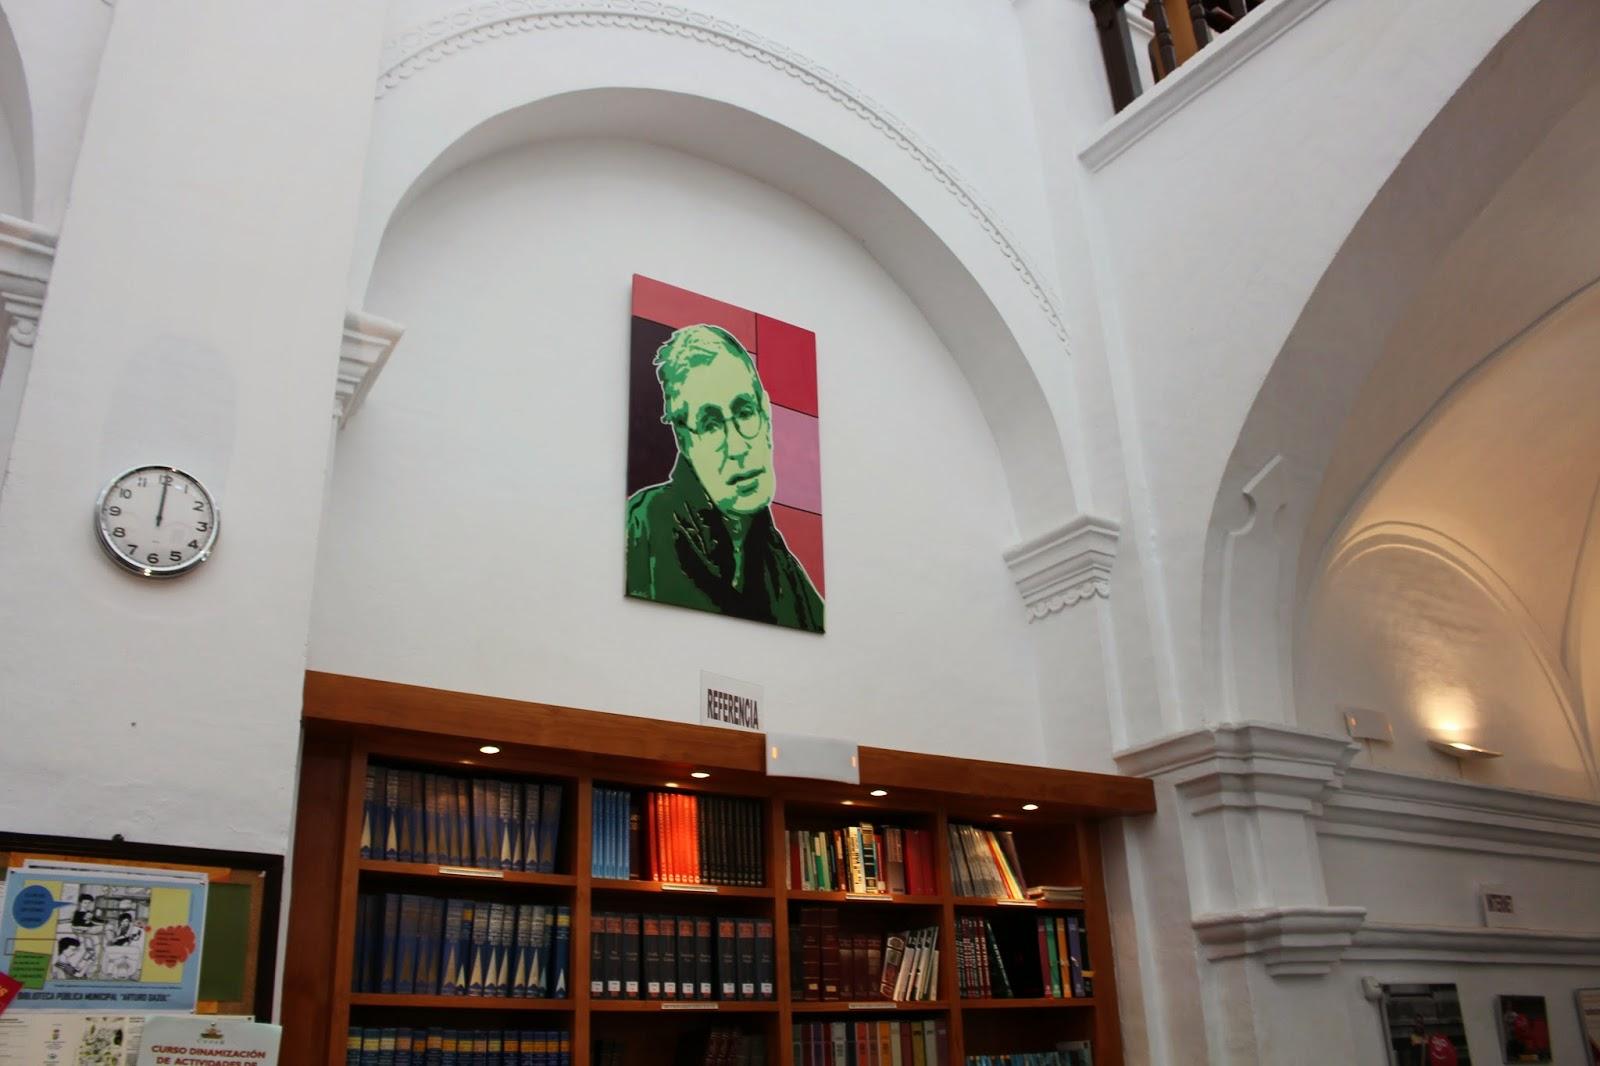 Narrogeographic conociendo la biblioteca arturo gazul en for Biblioteca iglesia madrid